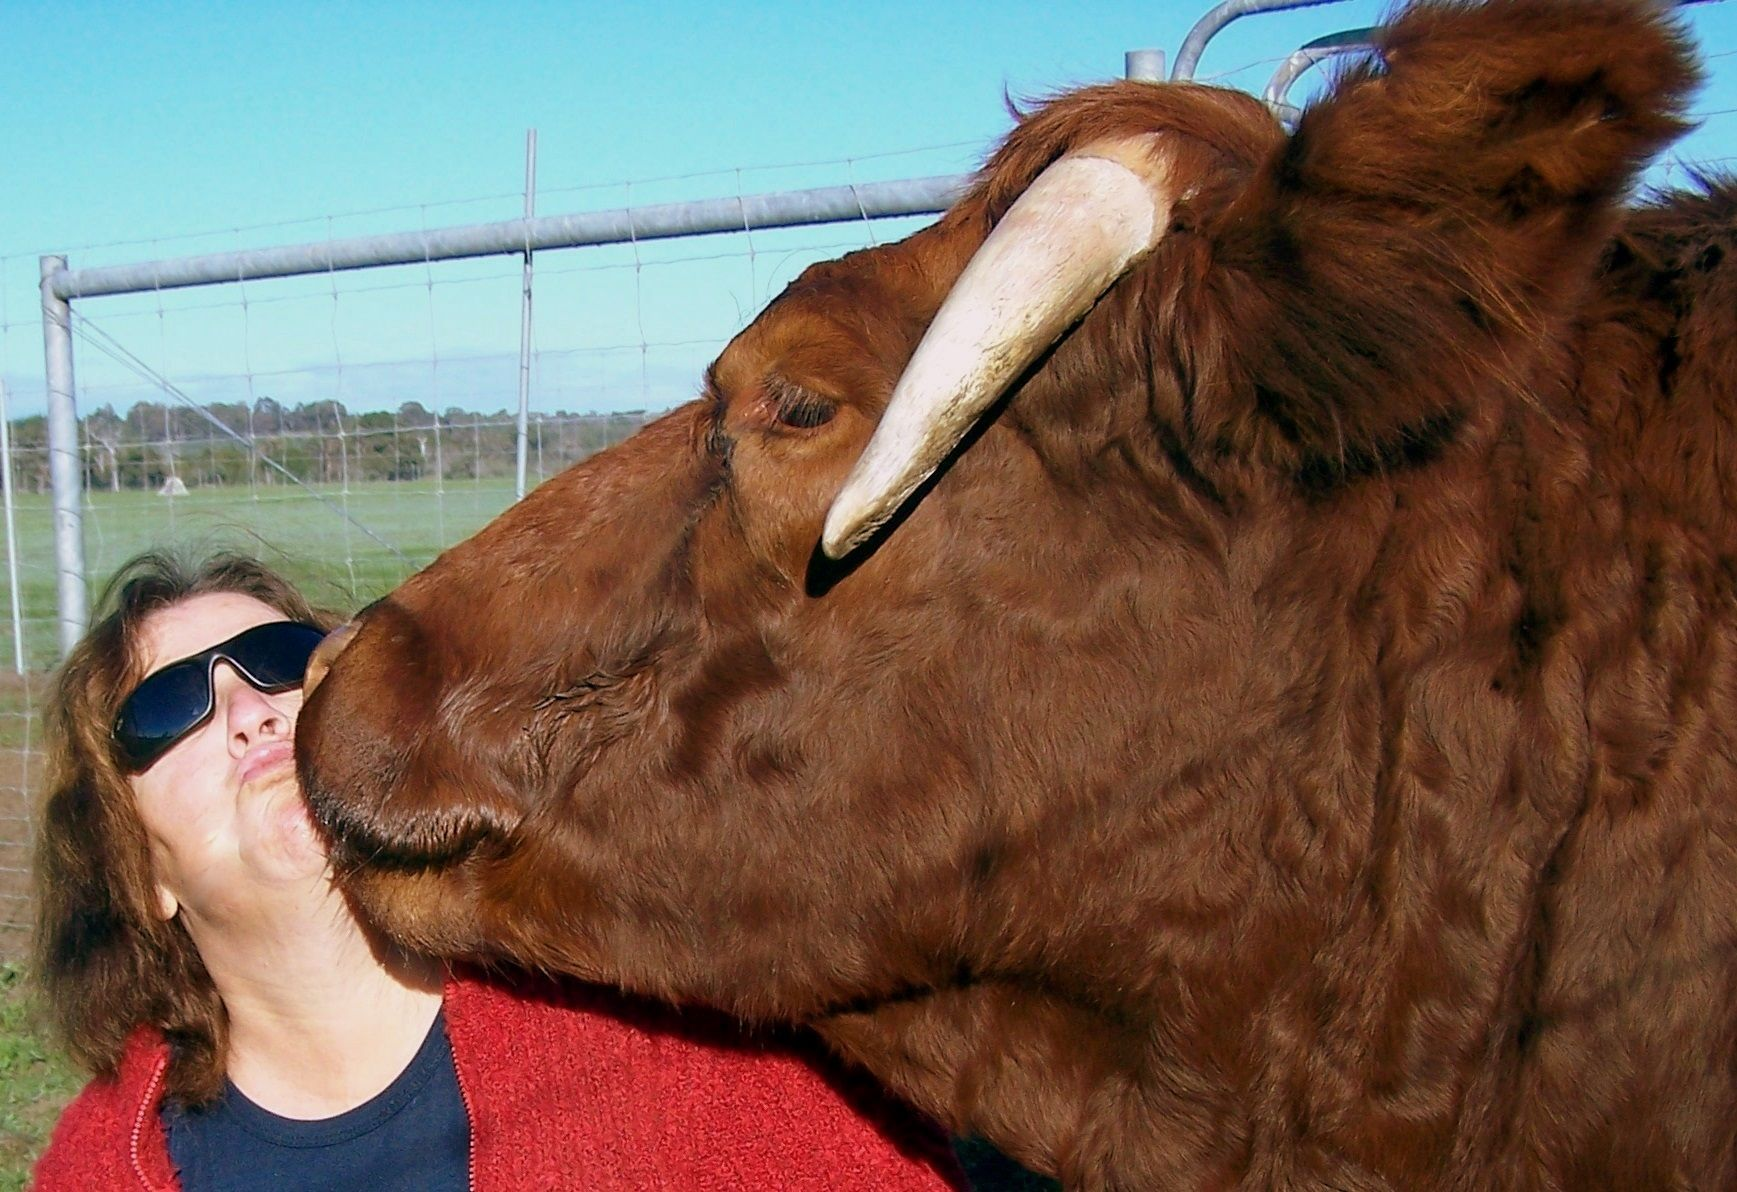 Whos a big Cow now